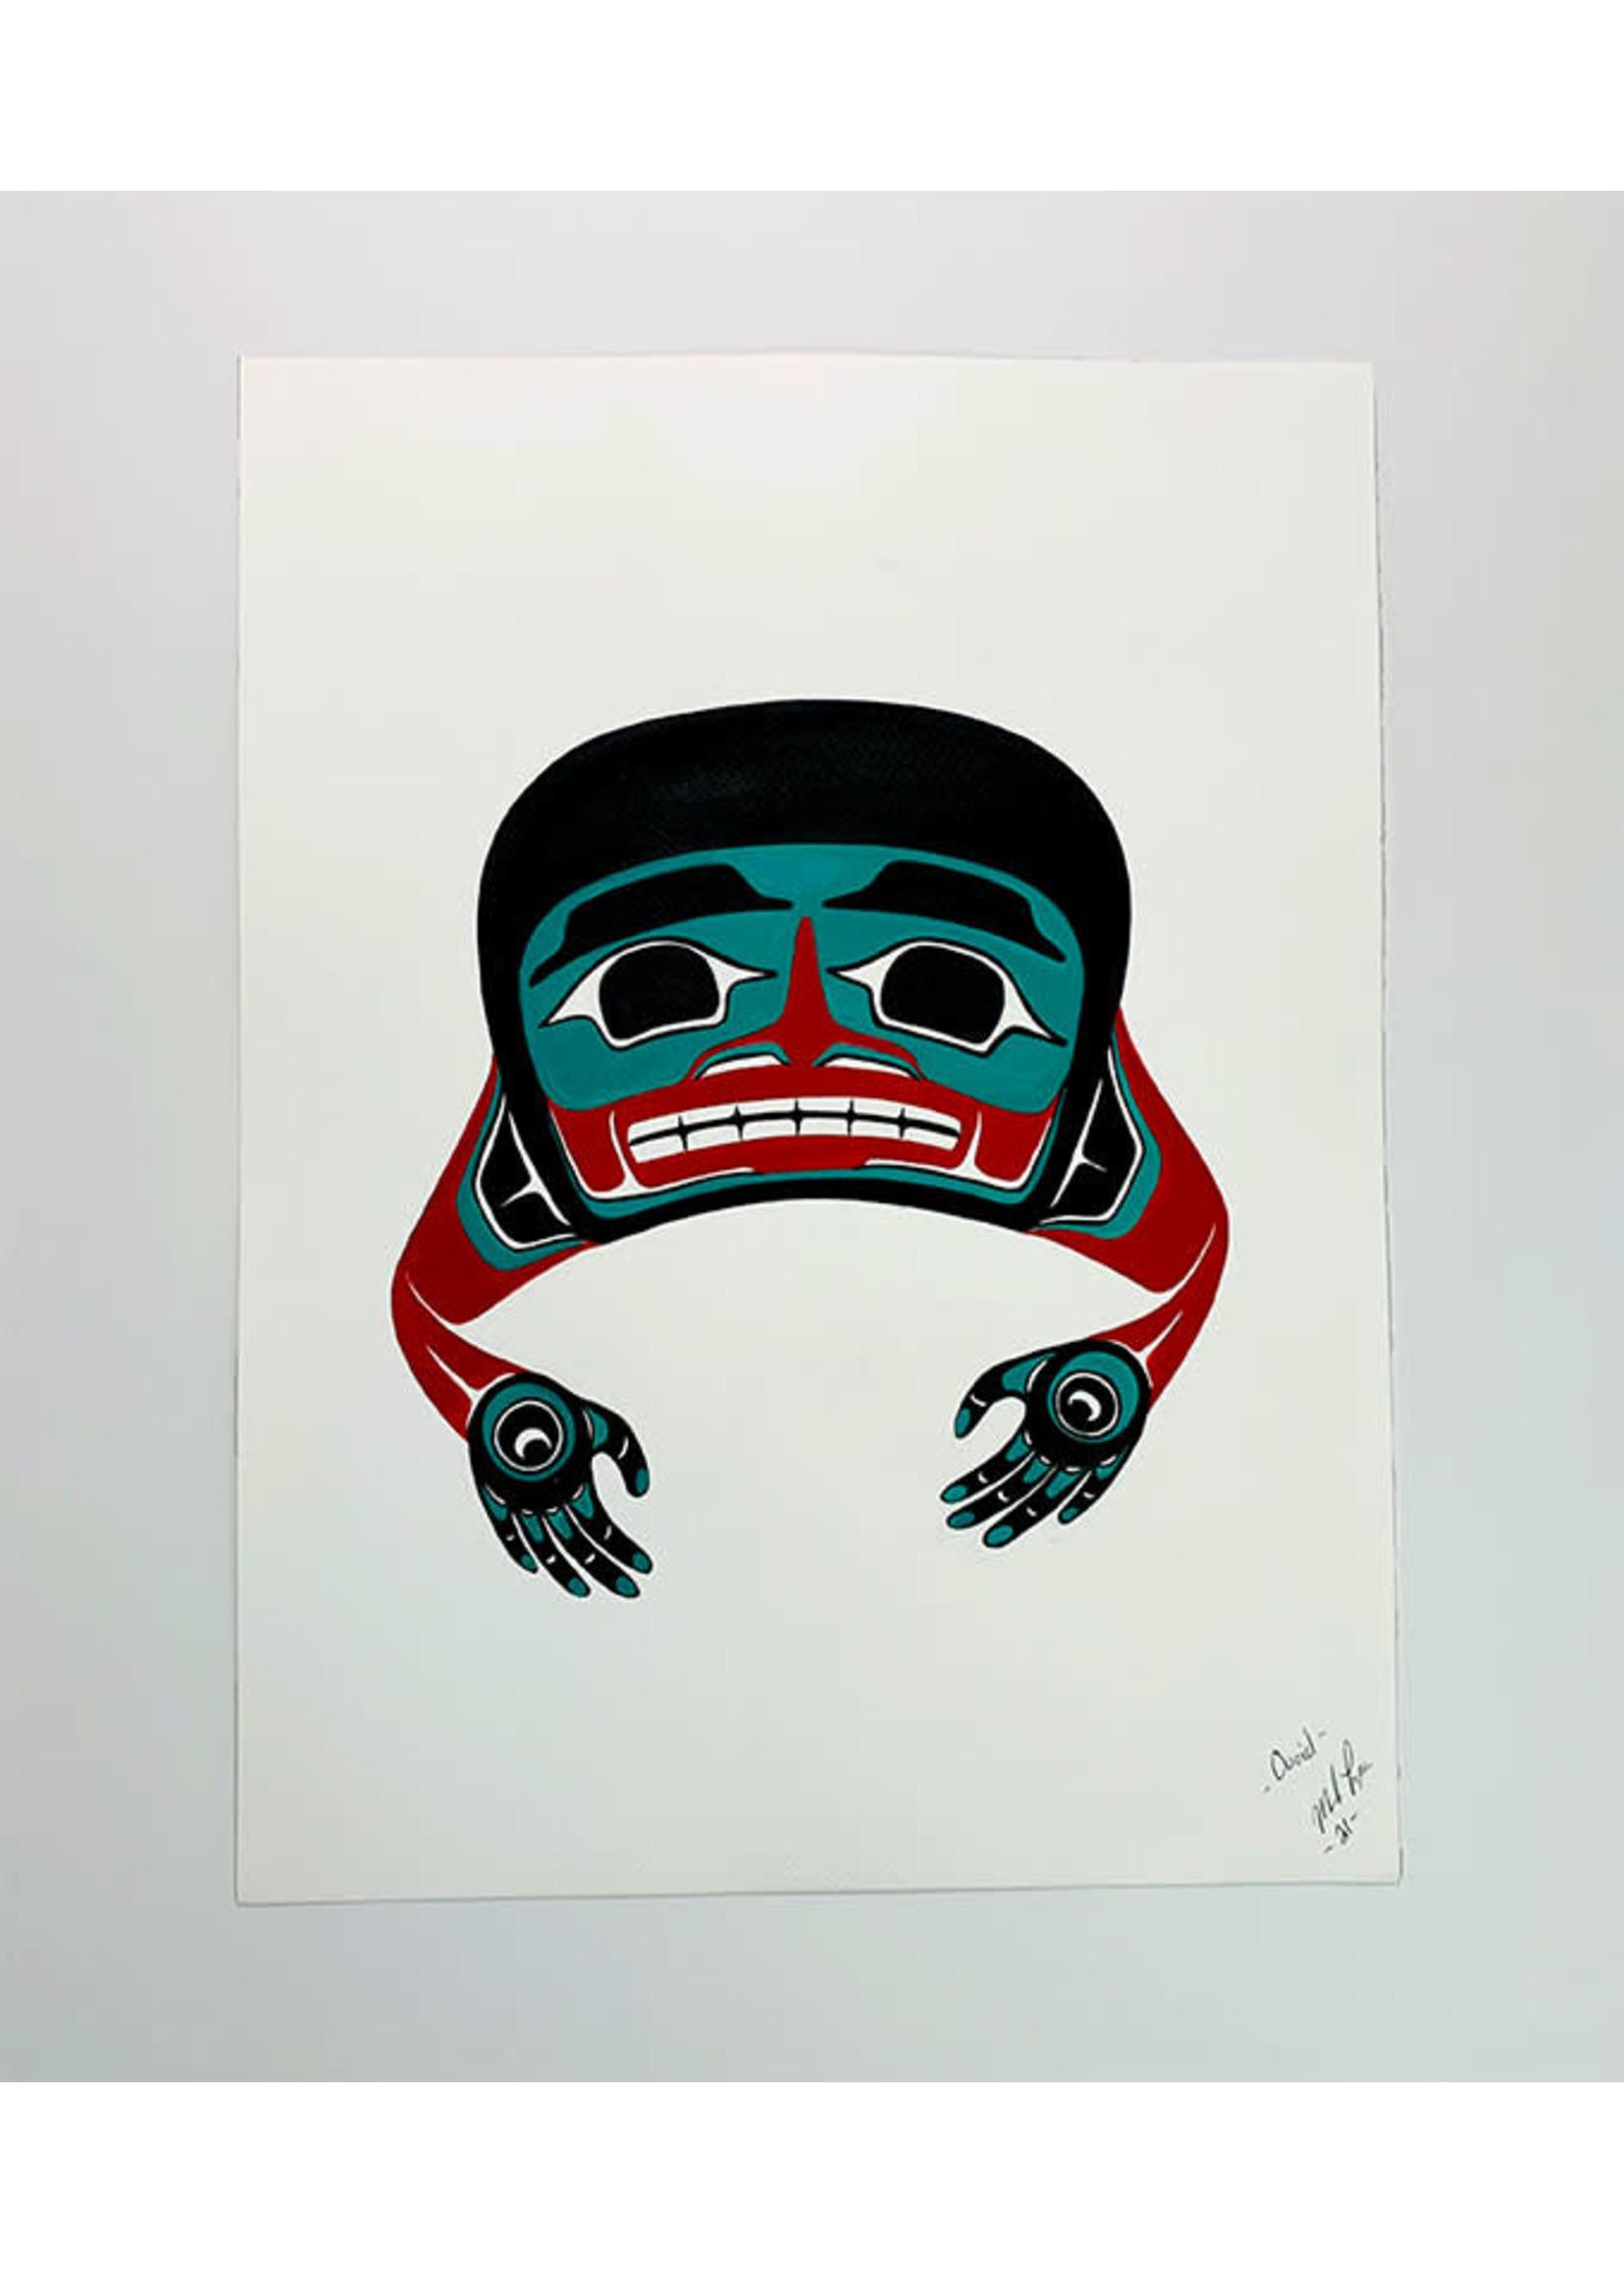 Ovoid - Acrylic on Paper